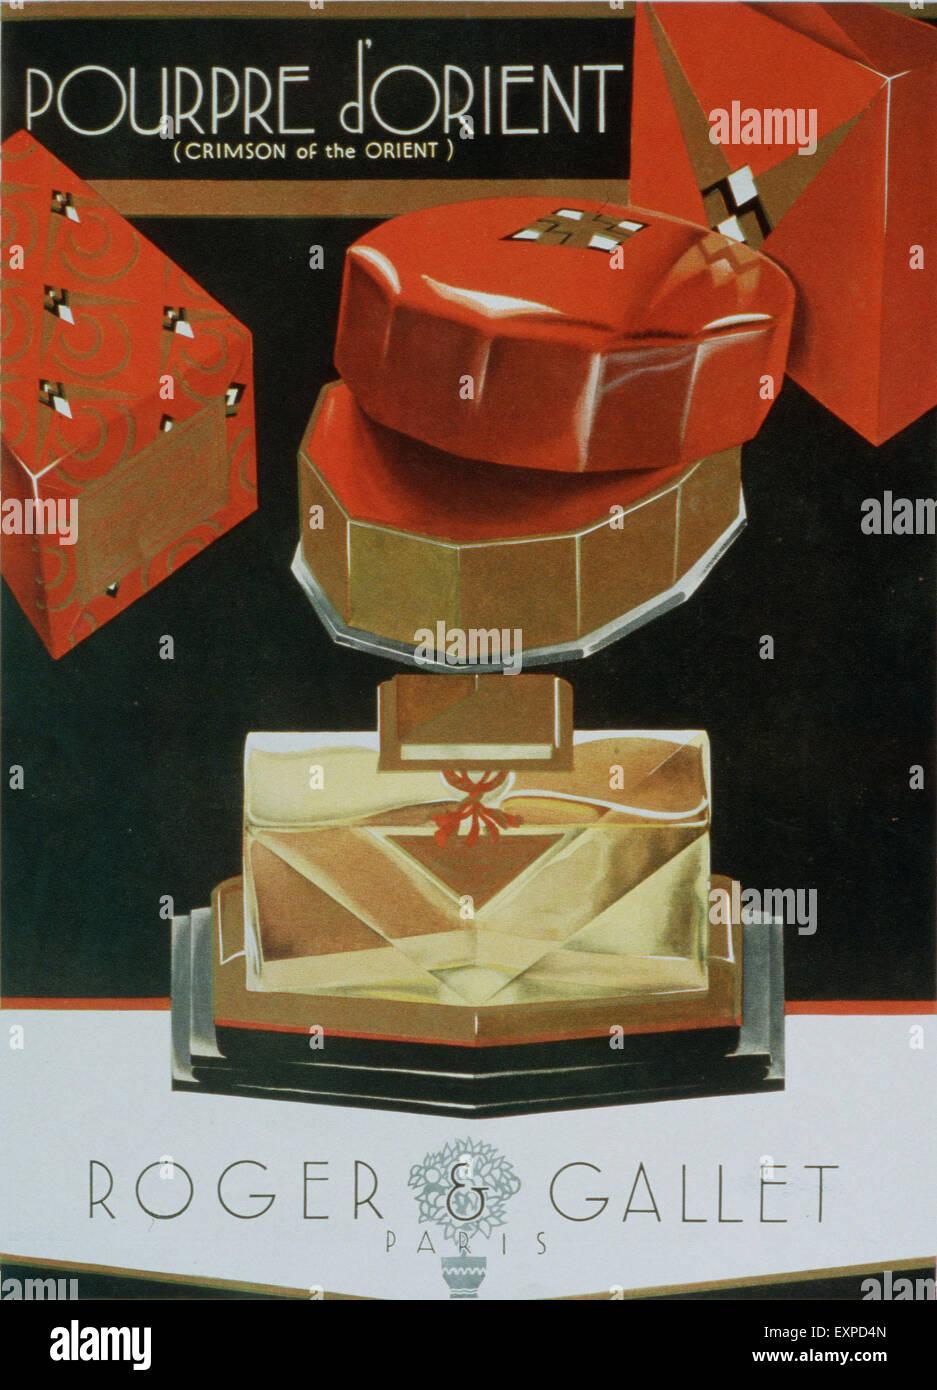 1930 UK Roger Gallet Revista anuncio Foto de stock